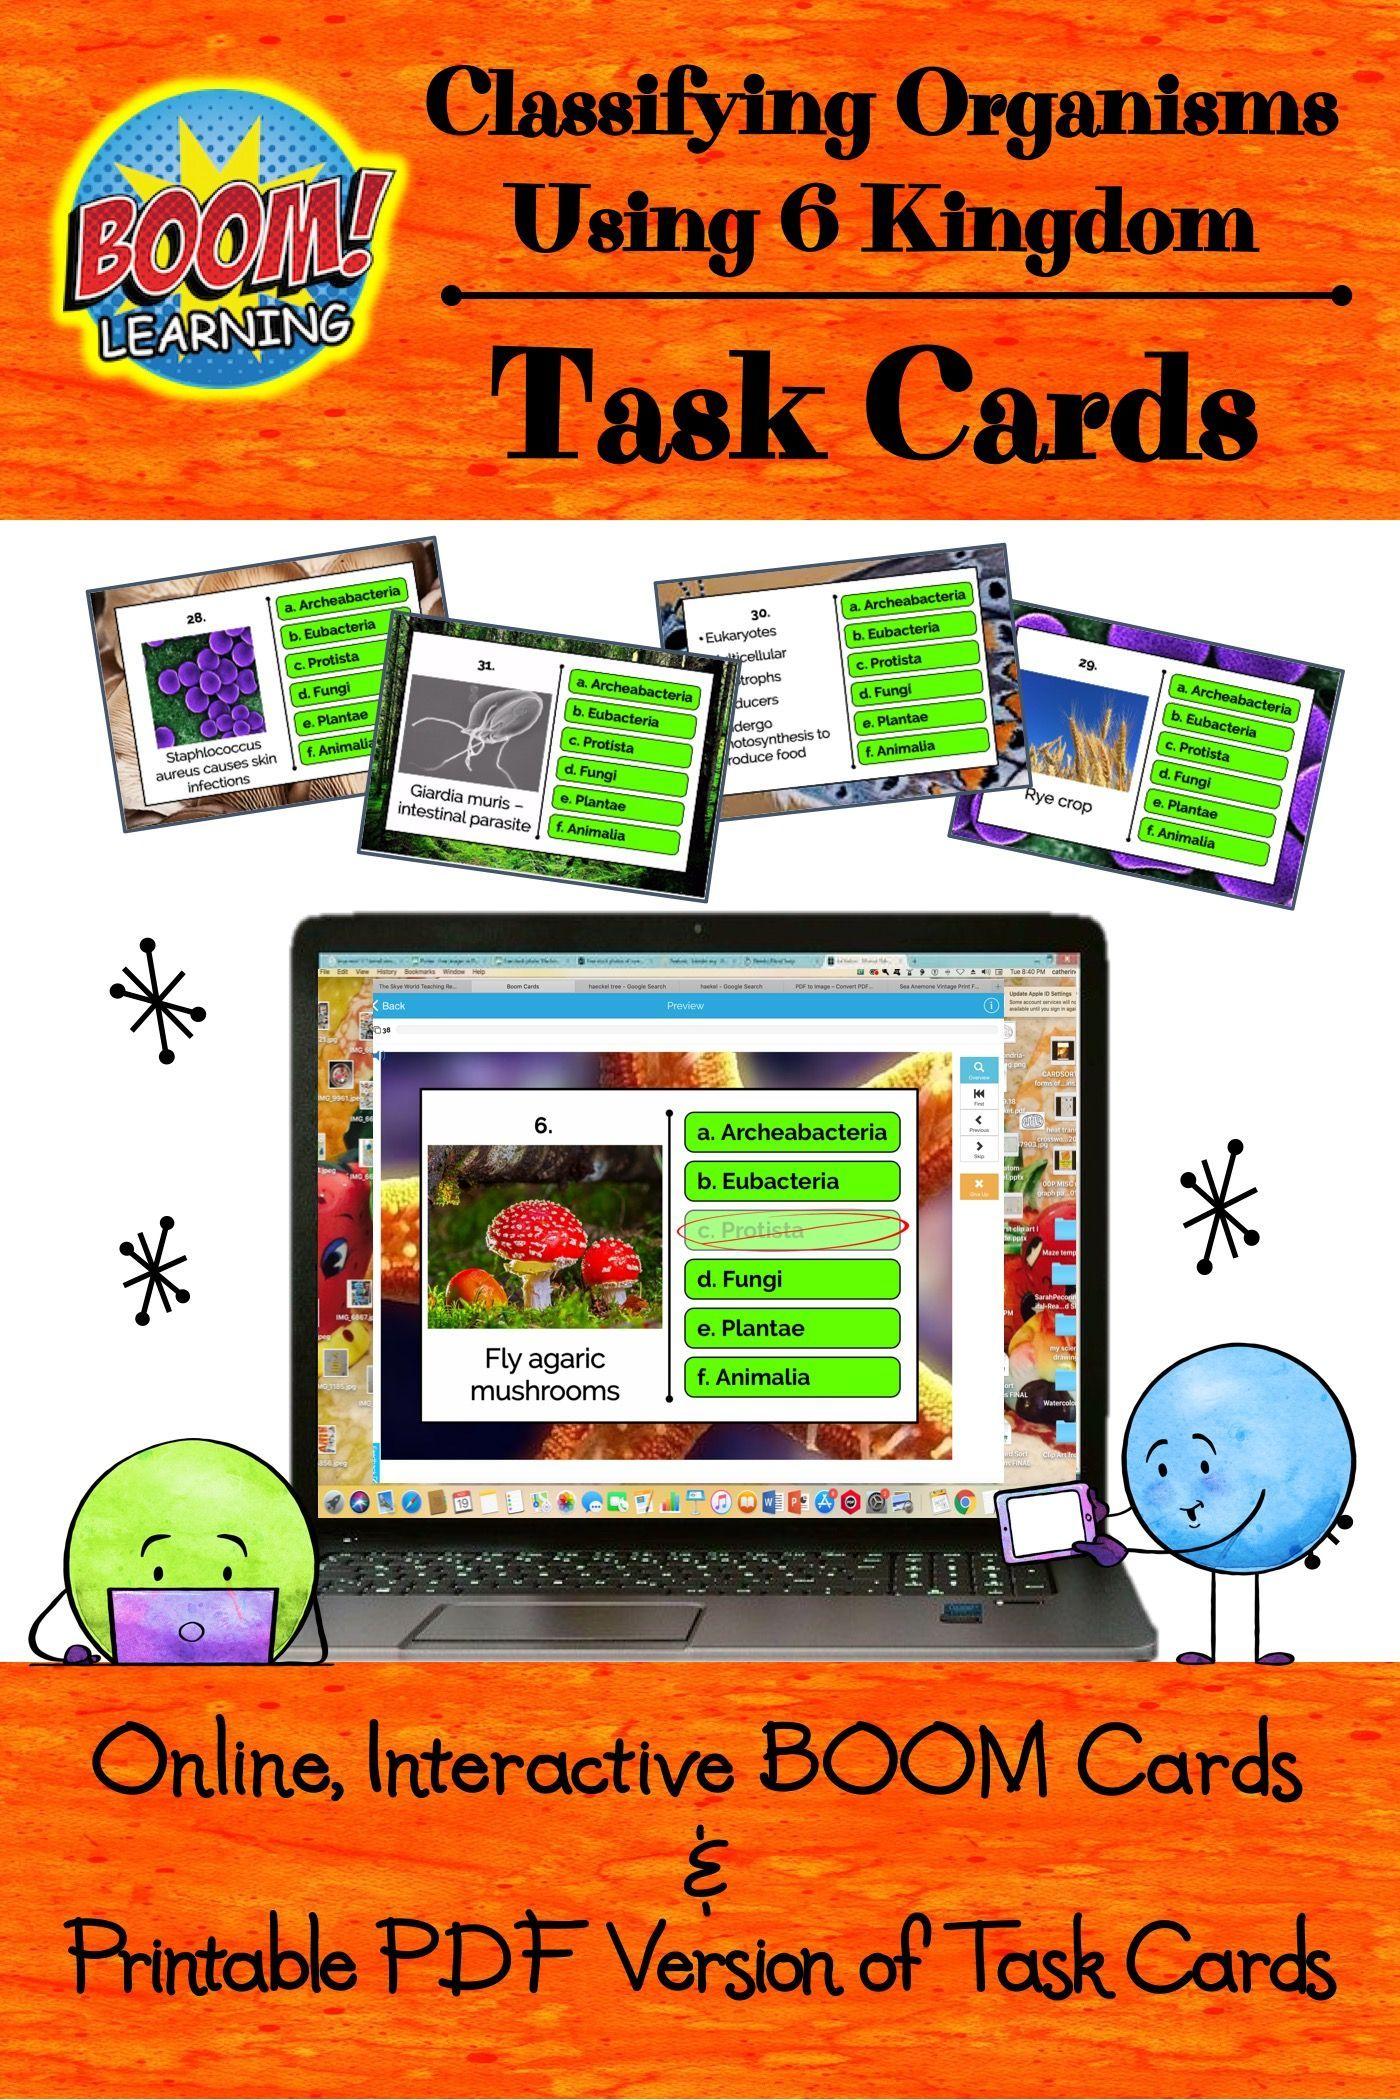 6 Kingdom Classification Task Cards